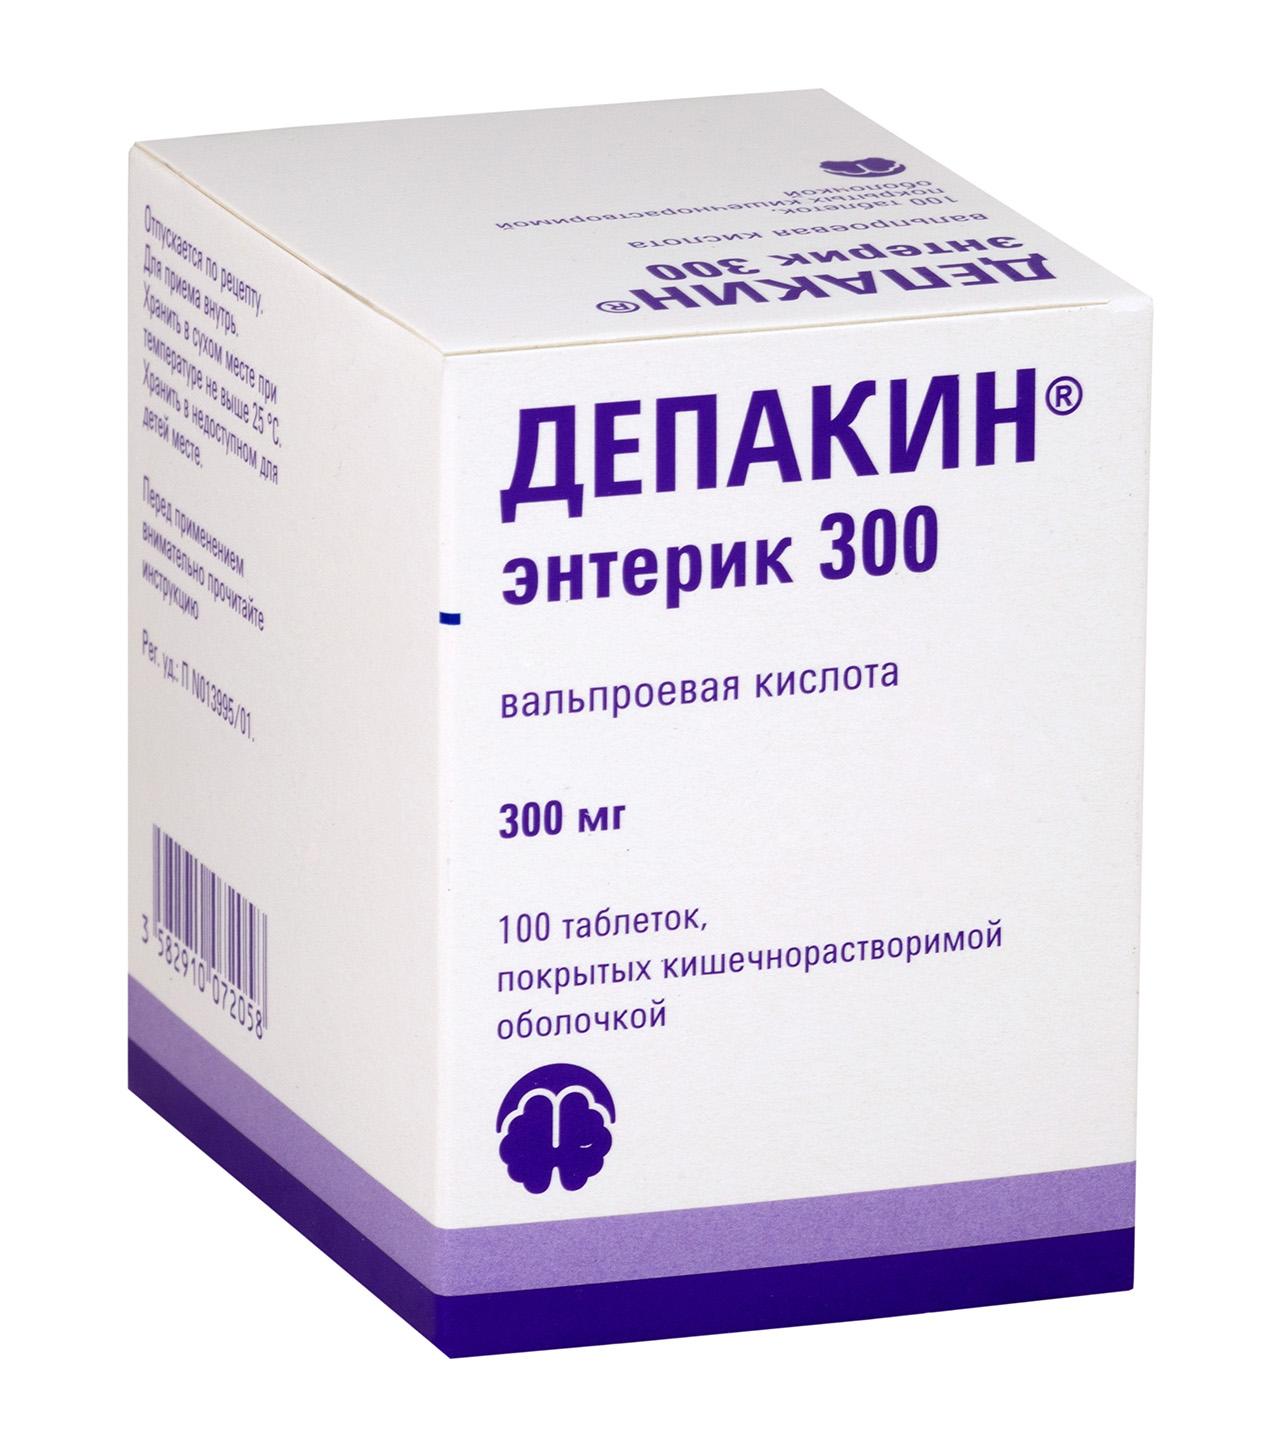 Депакин энтерик 300 таб. п.о кш/раств 300мг n100